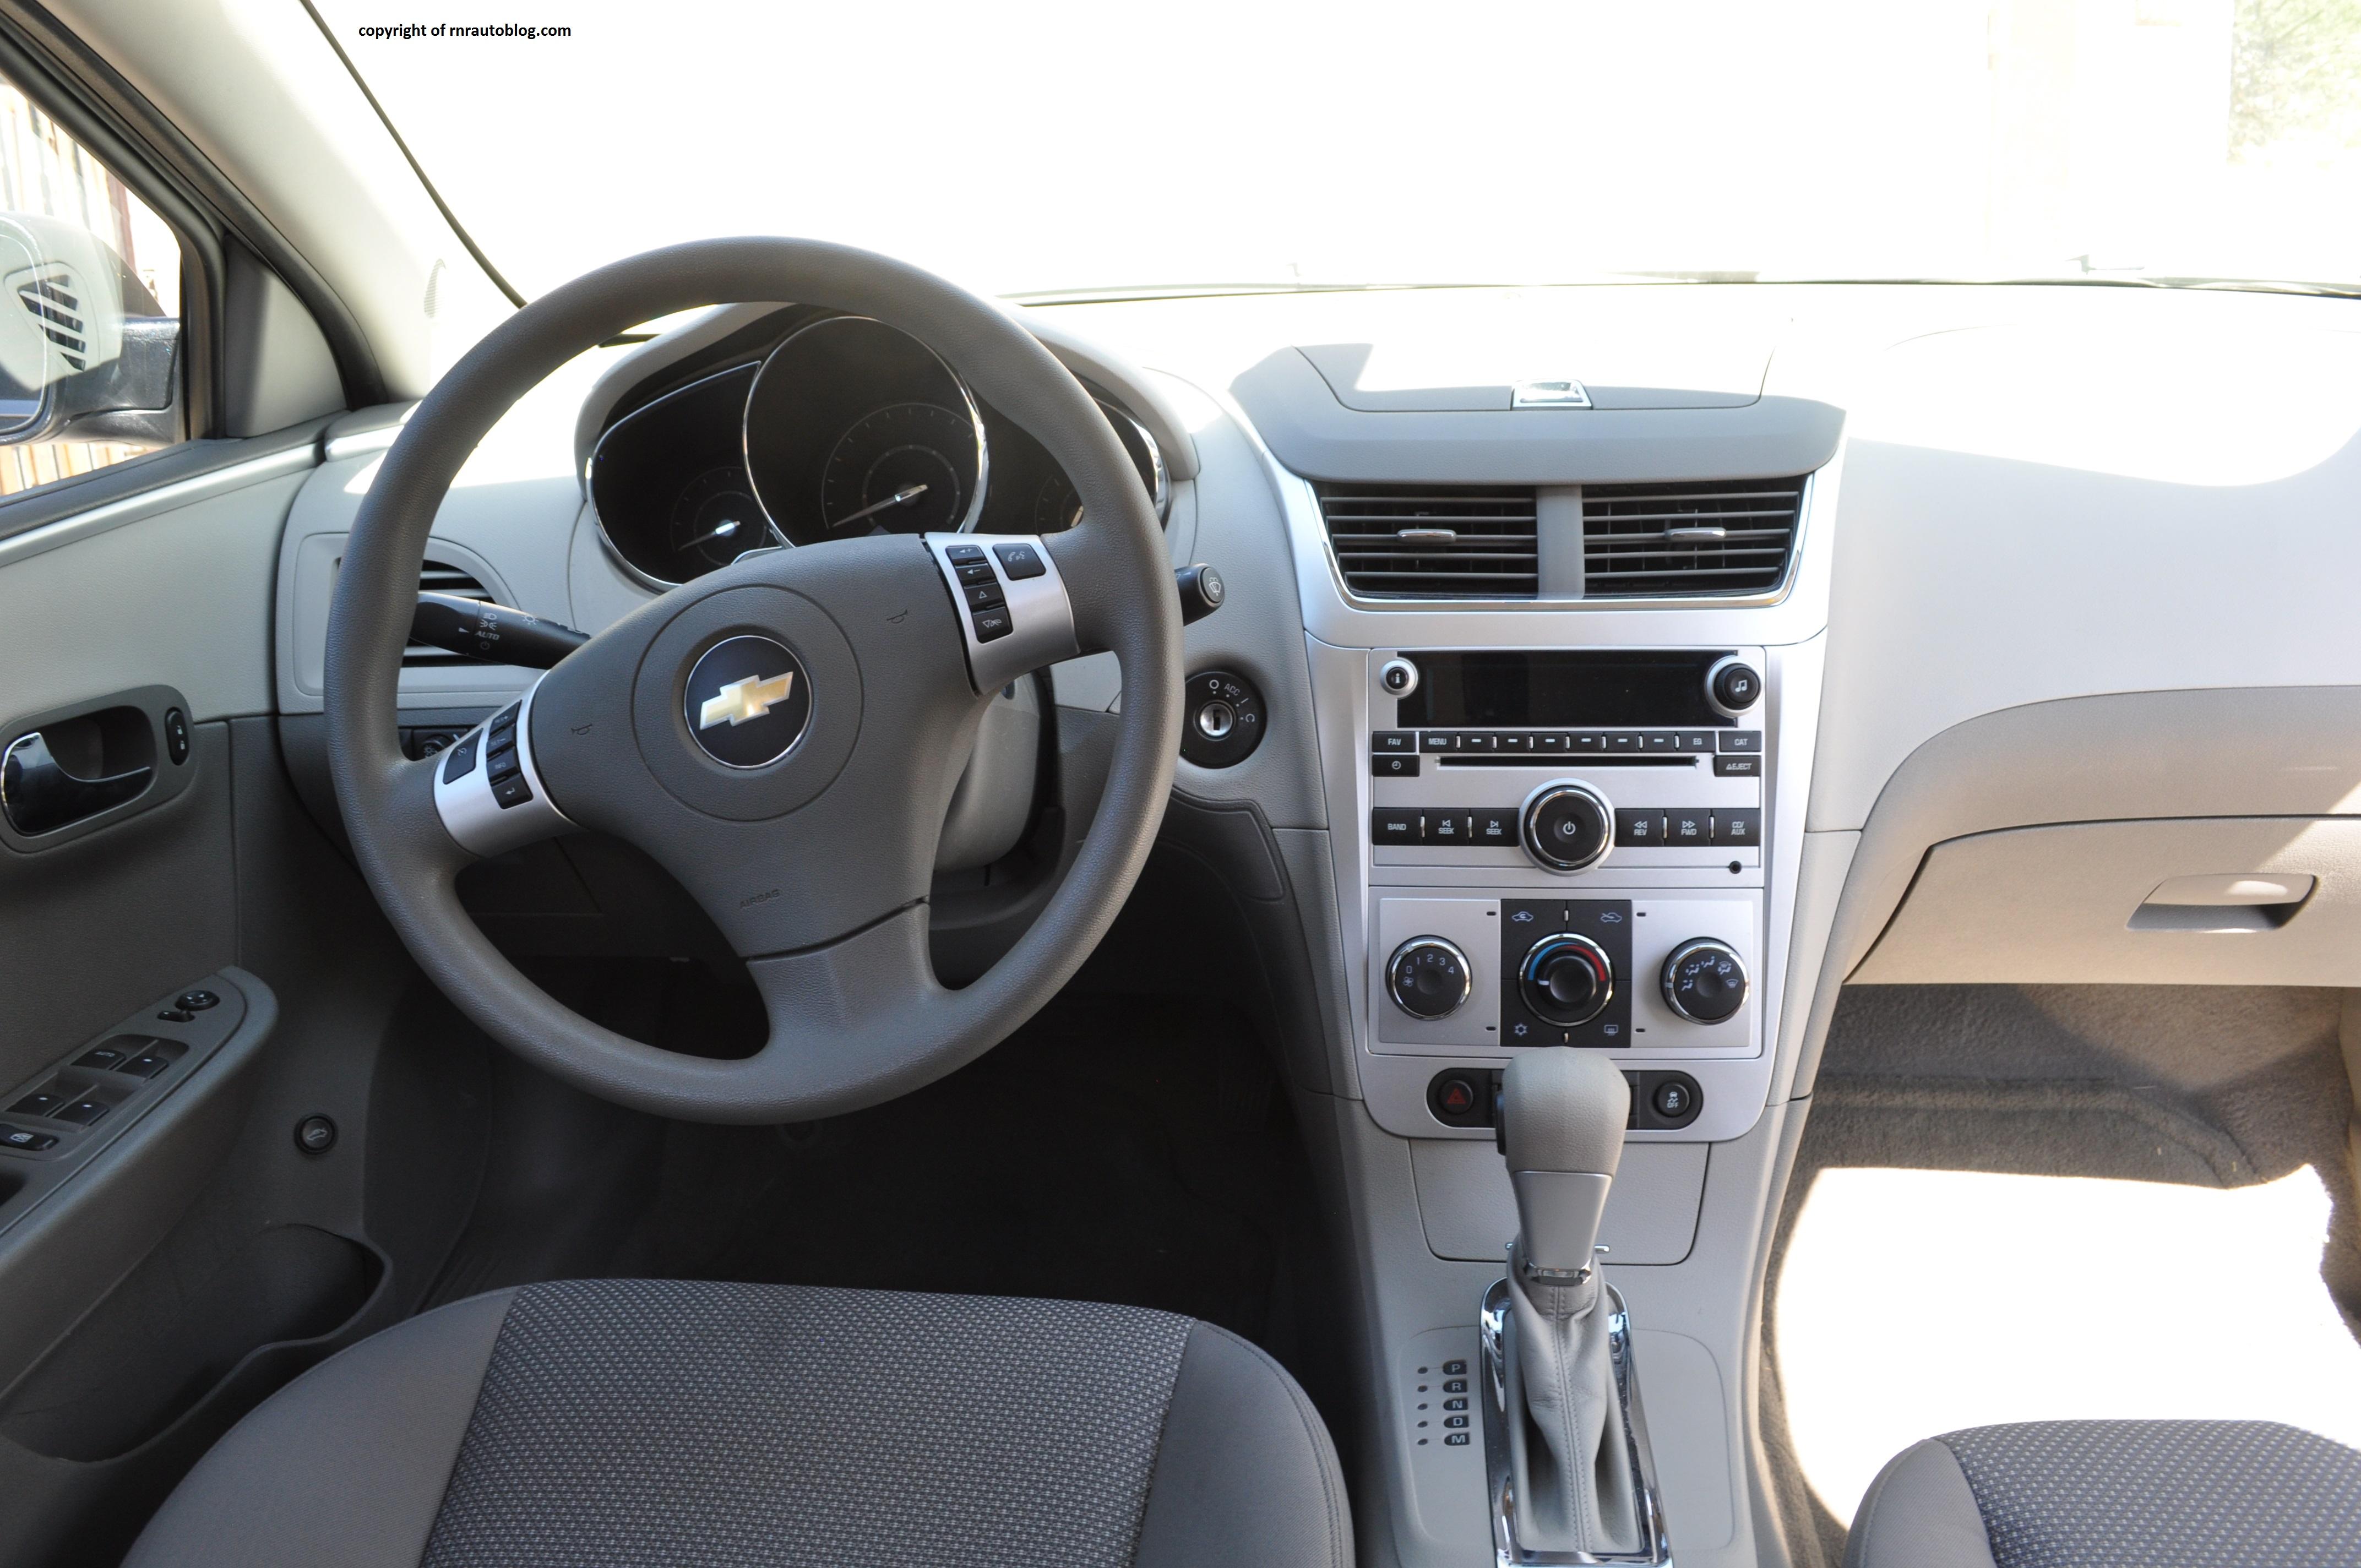 2014 Chevrolet Malibu Ls U003eu003e 2012 Chevrolet Malibu LS Review | RNR  Automotive Blog